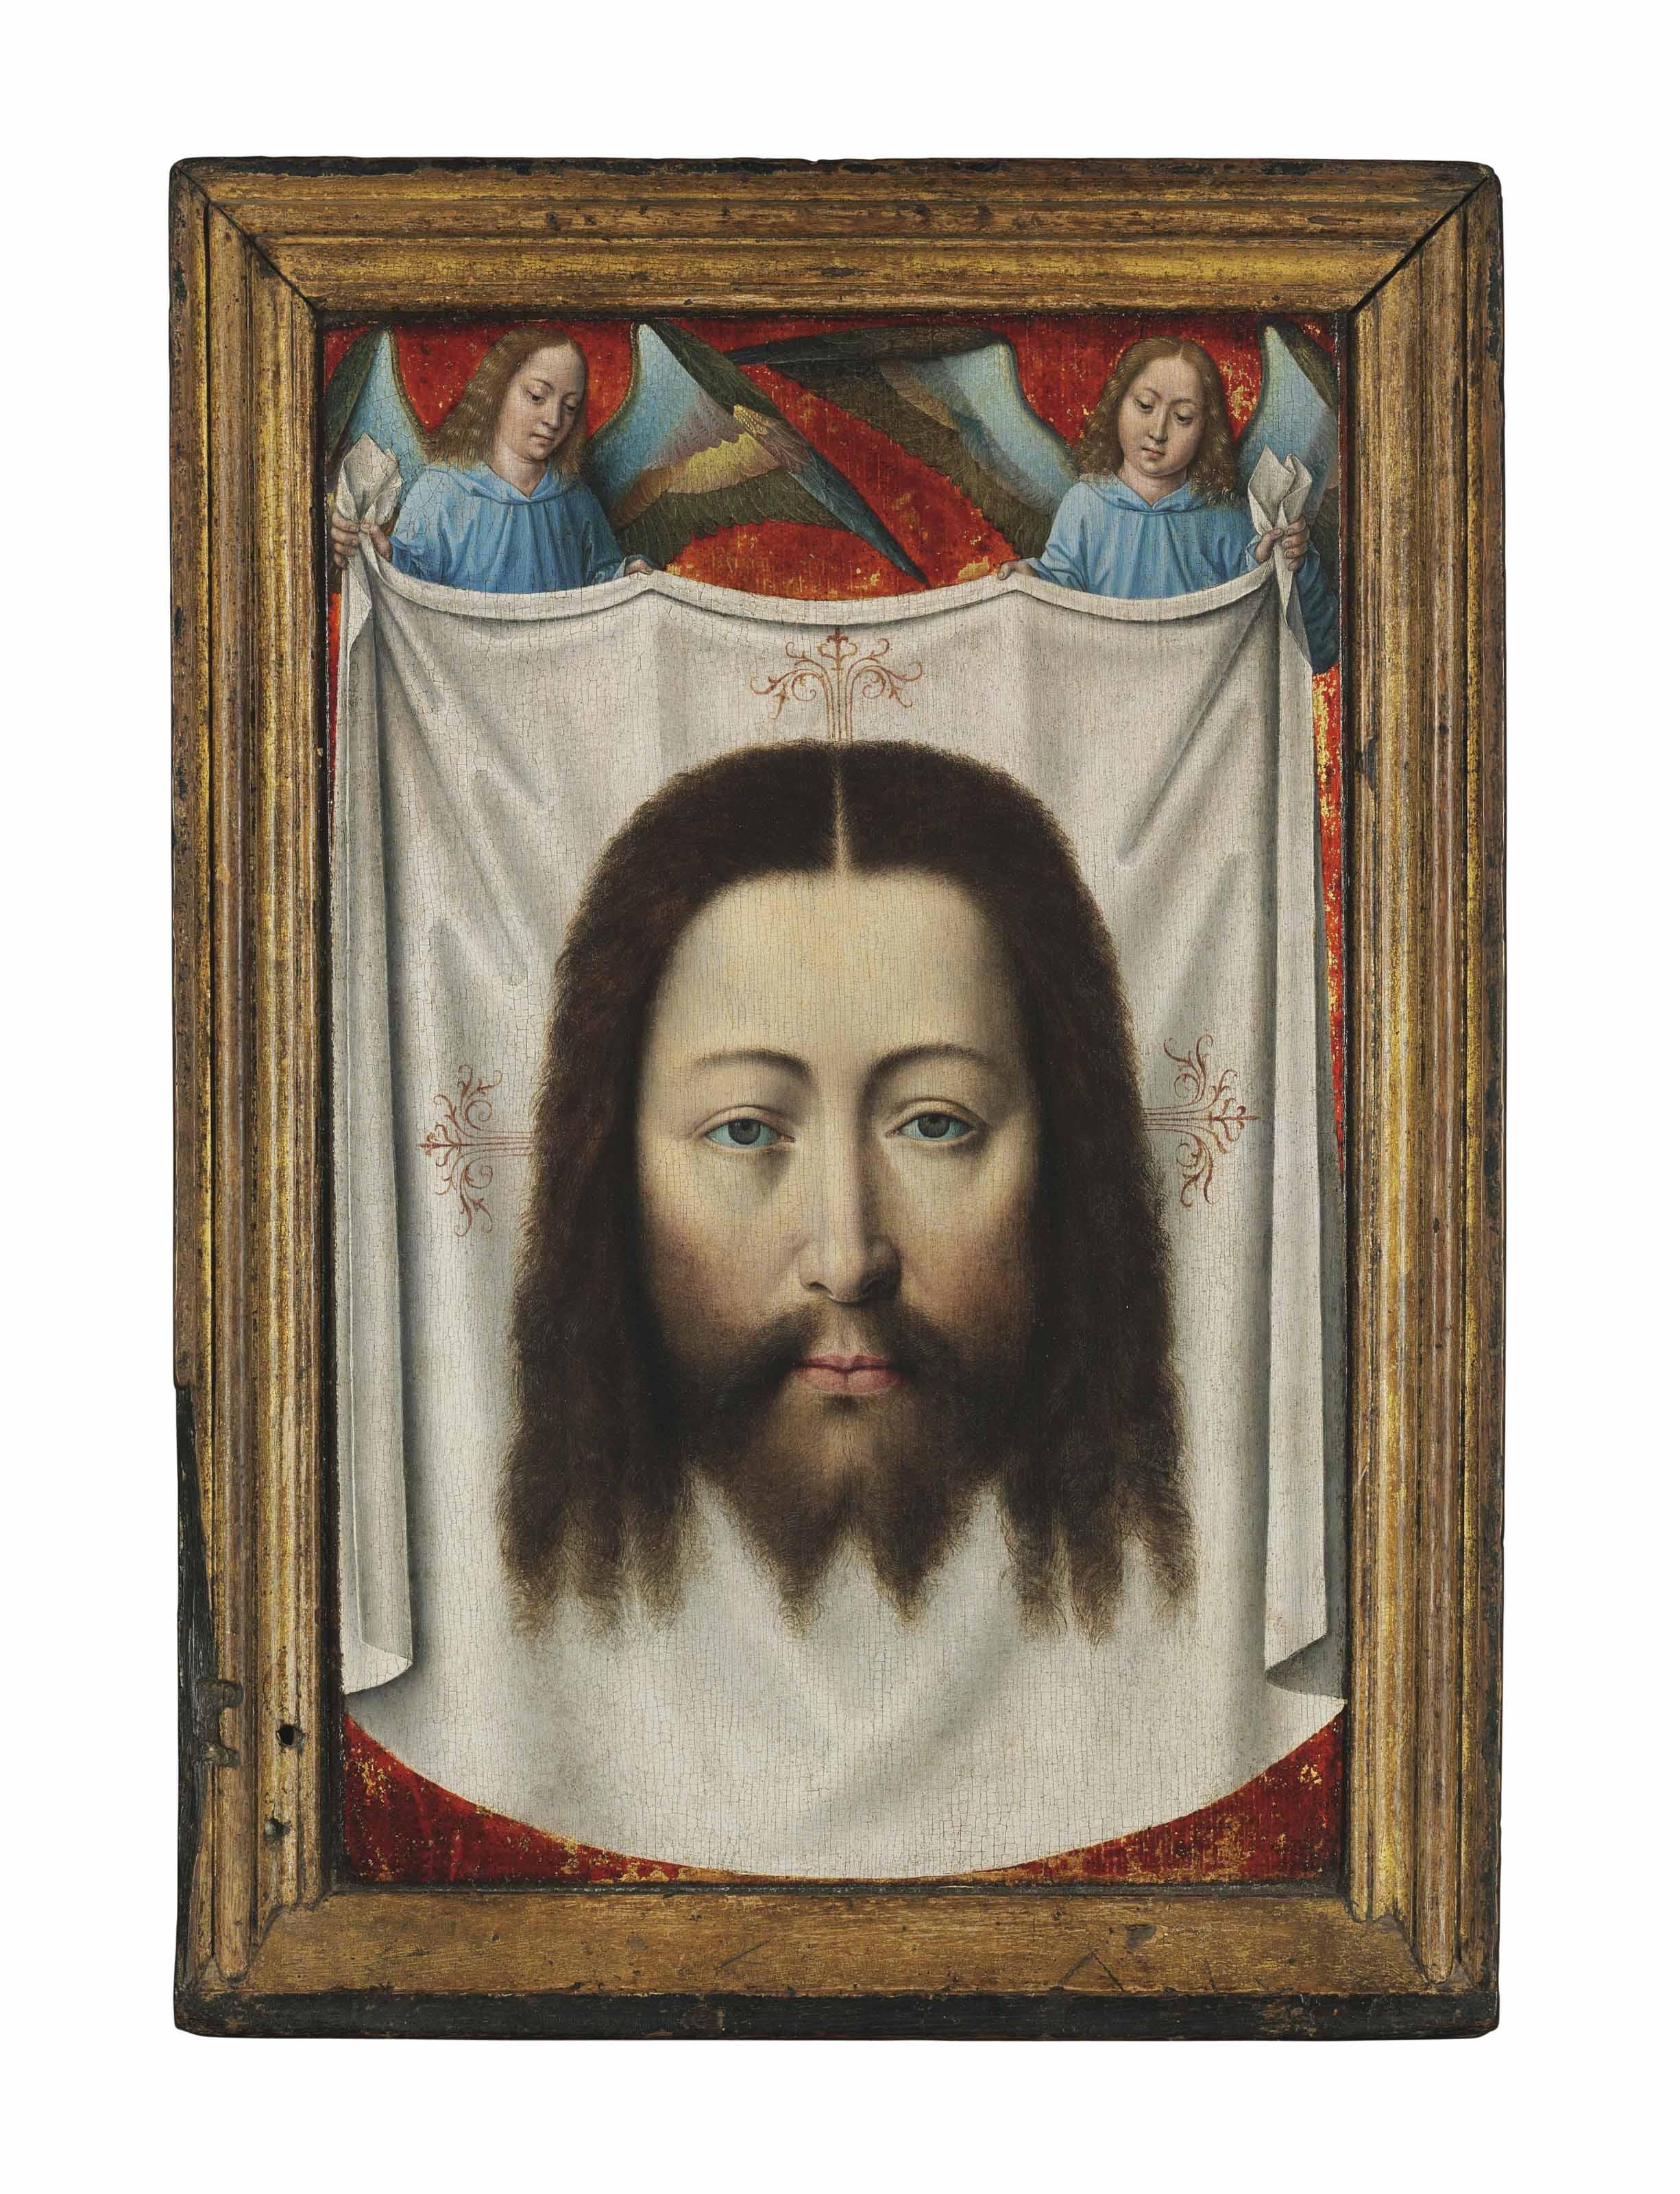 The Master of the Legend of Saint Ursula (active Bruges c. 1470-1500)